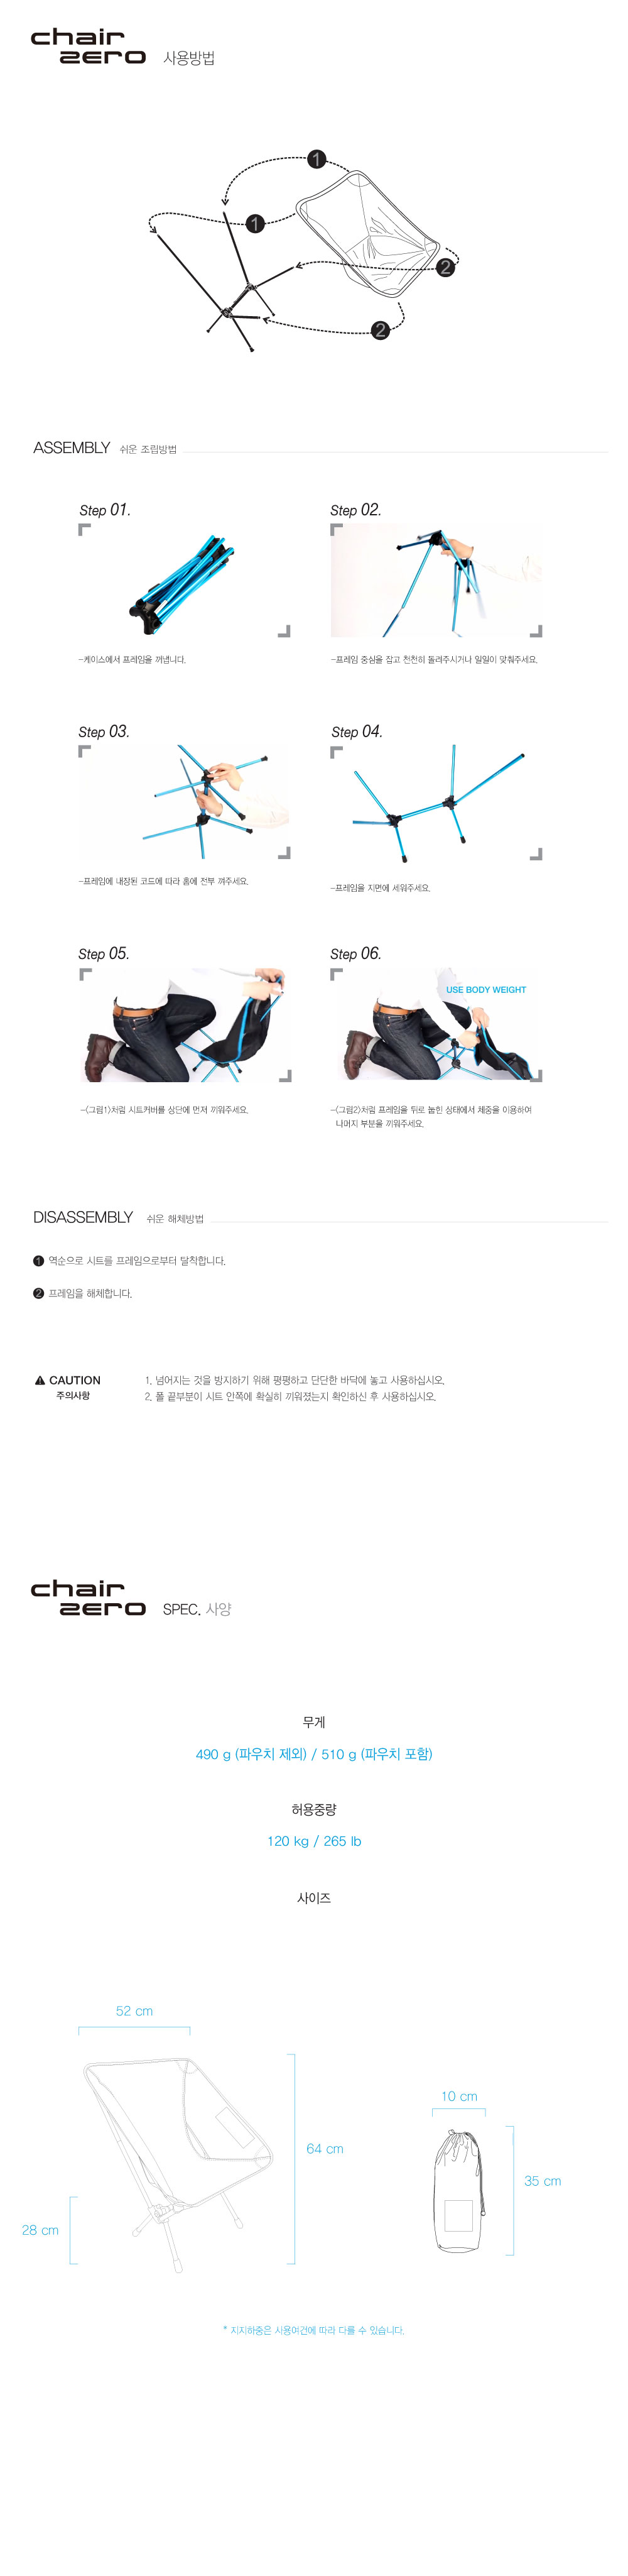 20180119-Chair-Zero-상품페이지-3.jpg